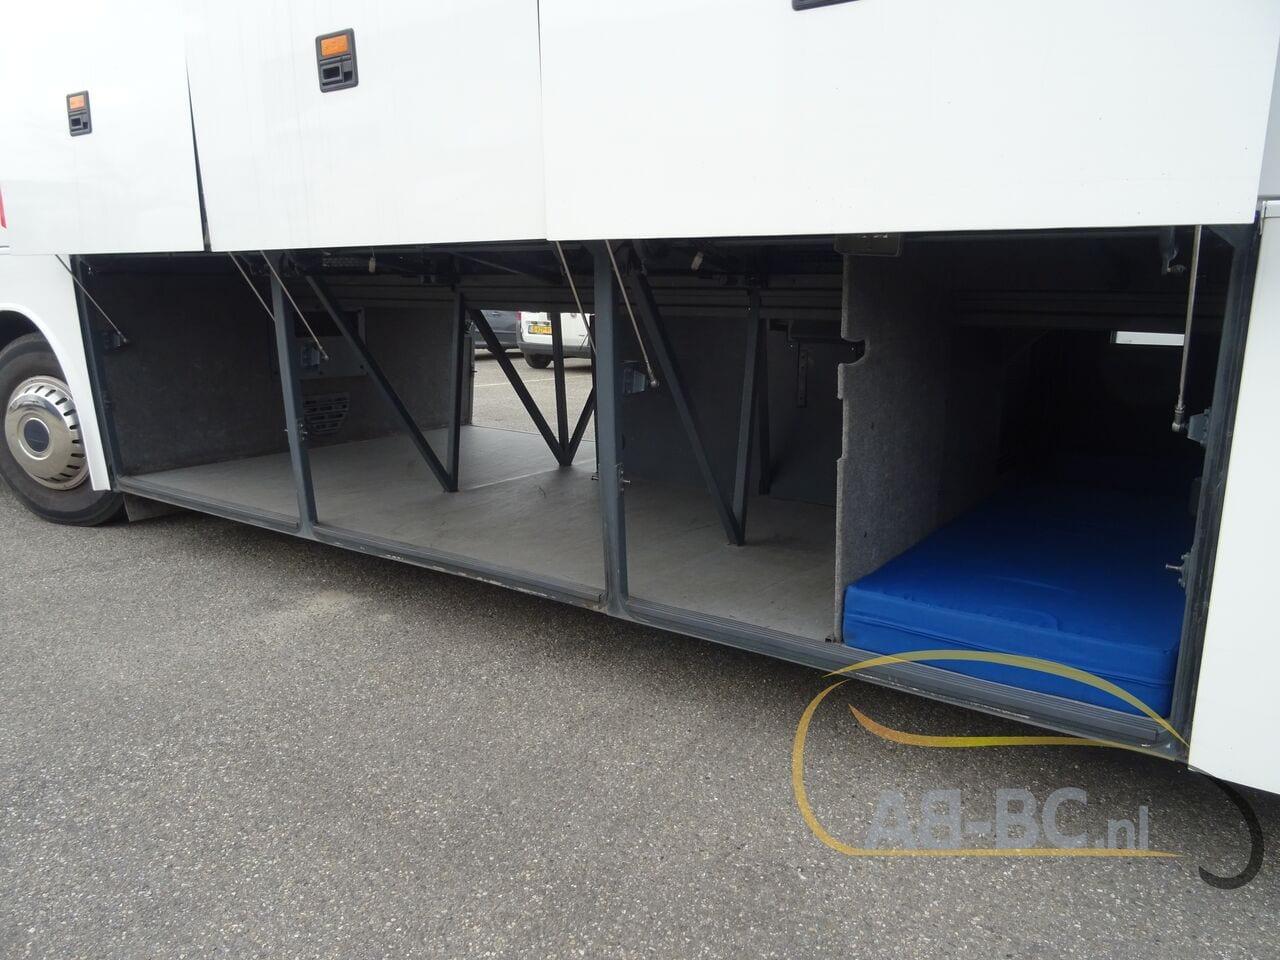 coach-busTEMSA-Safari-HD-51-Seats-EURO5-12-MTR---1614266410878031146_big_1e07201d0aa90d60fb211b7fbe9e9c6e--19052917224730818200